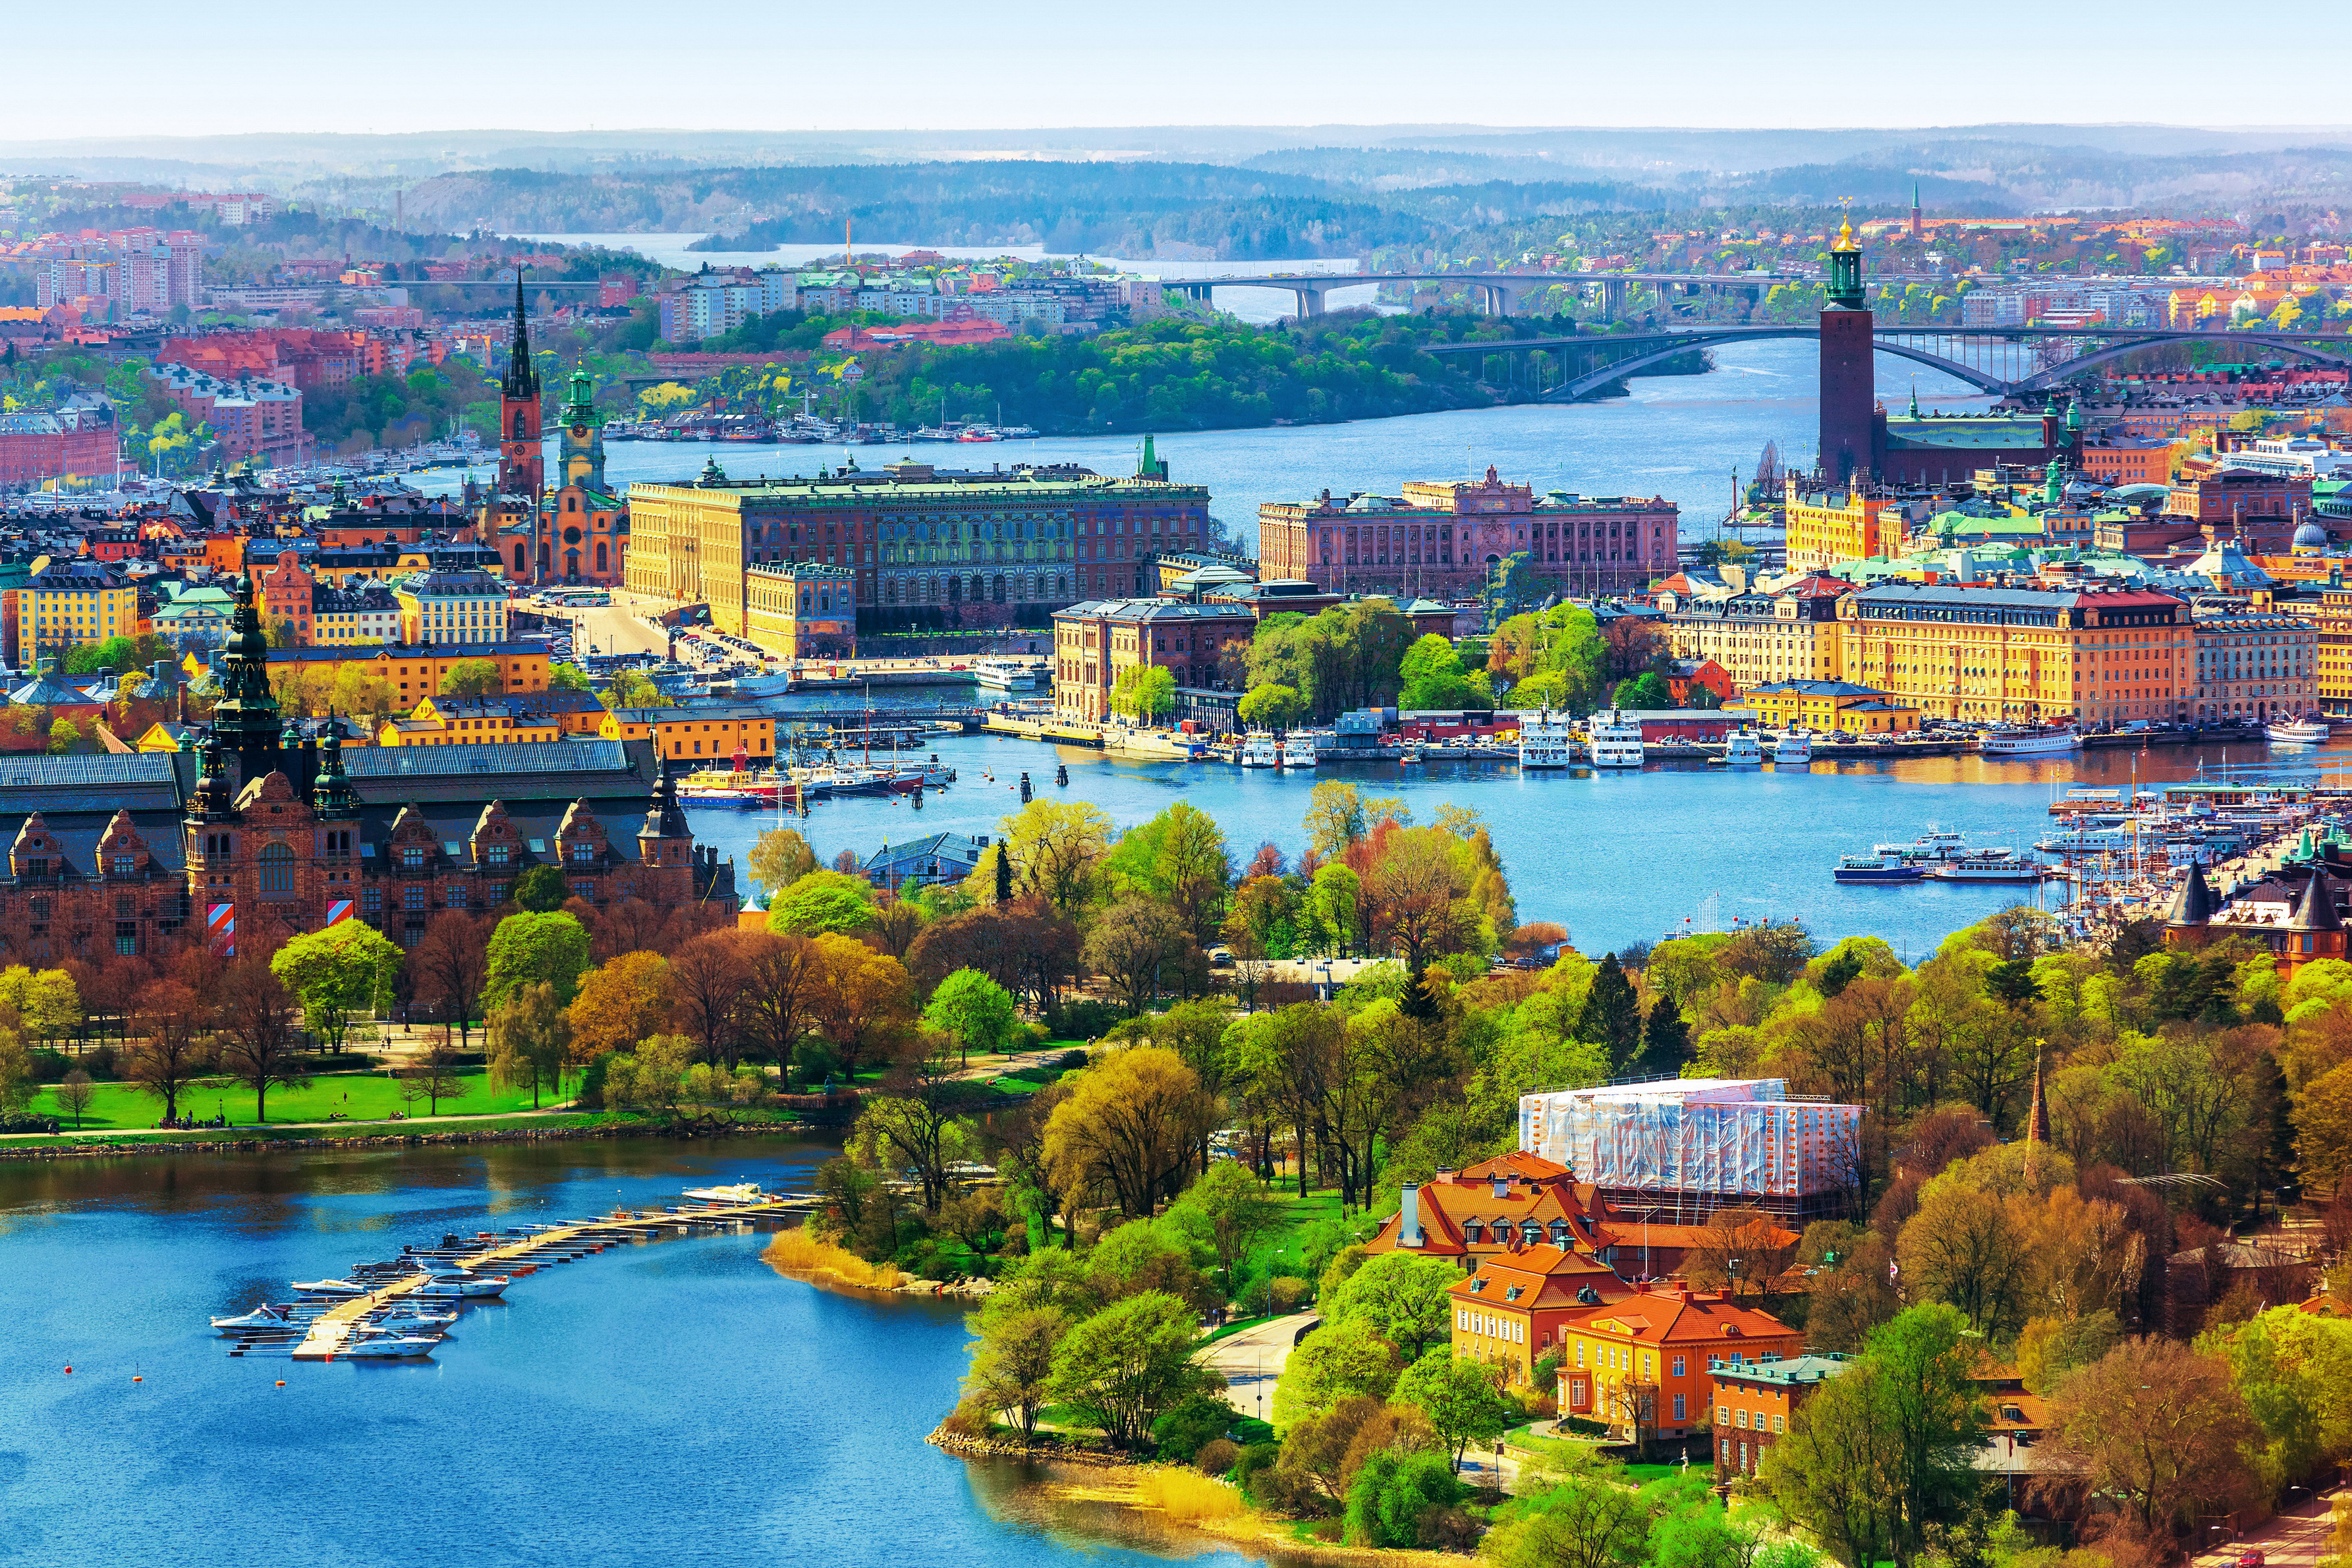 Stockholm Sweden Full HD Wallpaper And Background Image